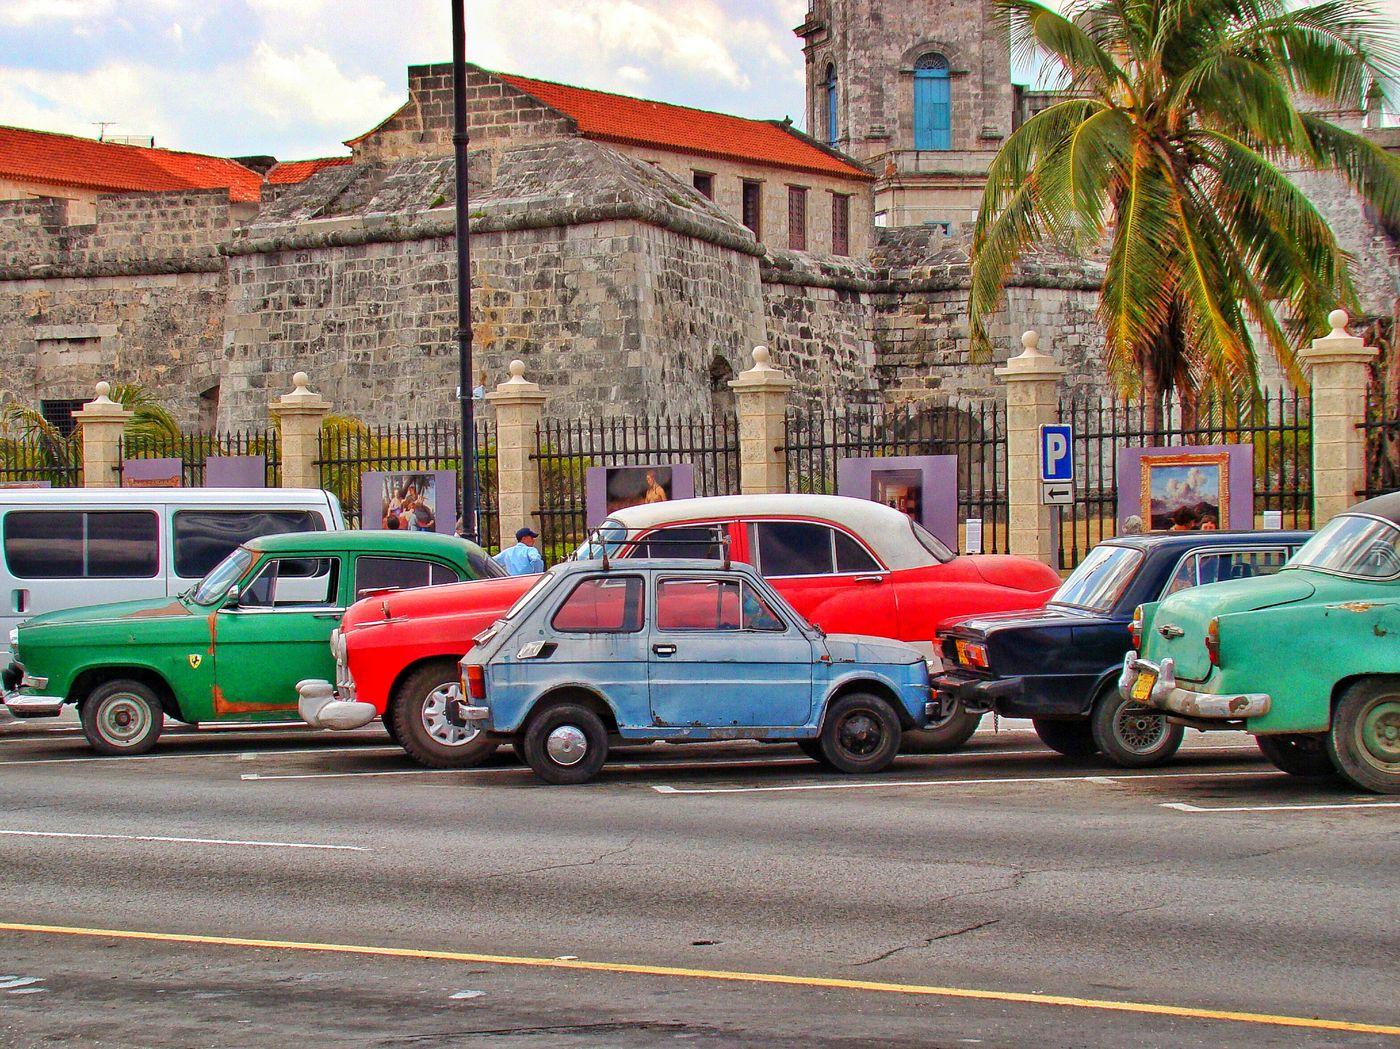 Раритетные автомобили фото с названиями наблюдал